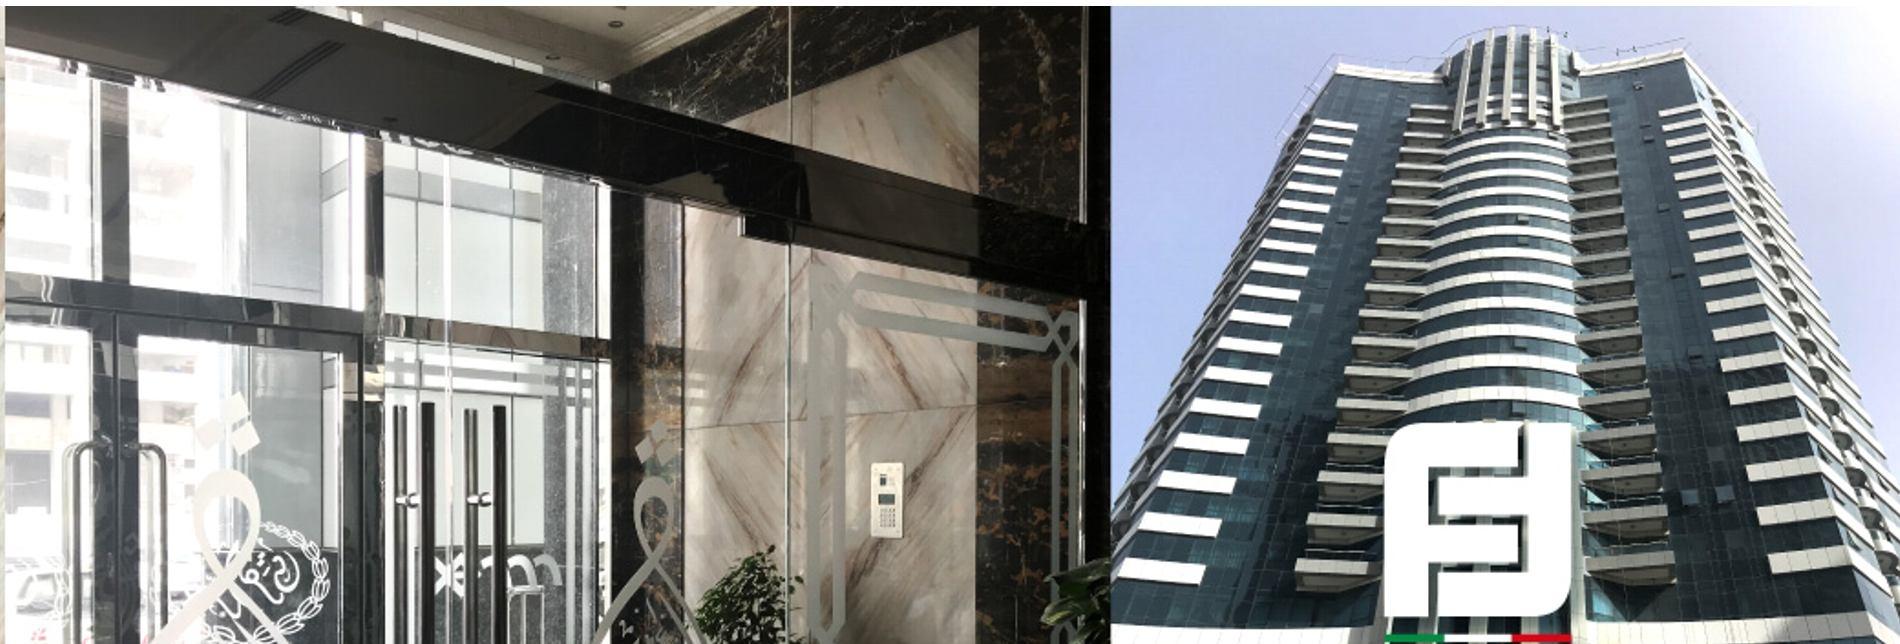 ASIE/ UI QURRA, Sharjah, Emirats Arabes Unis